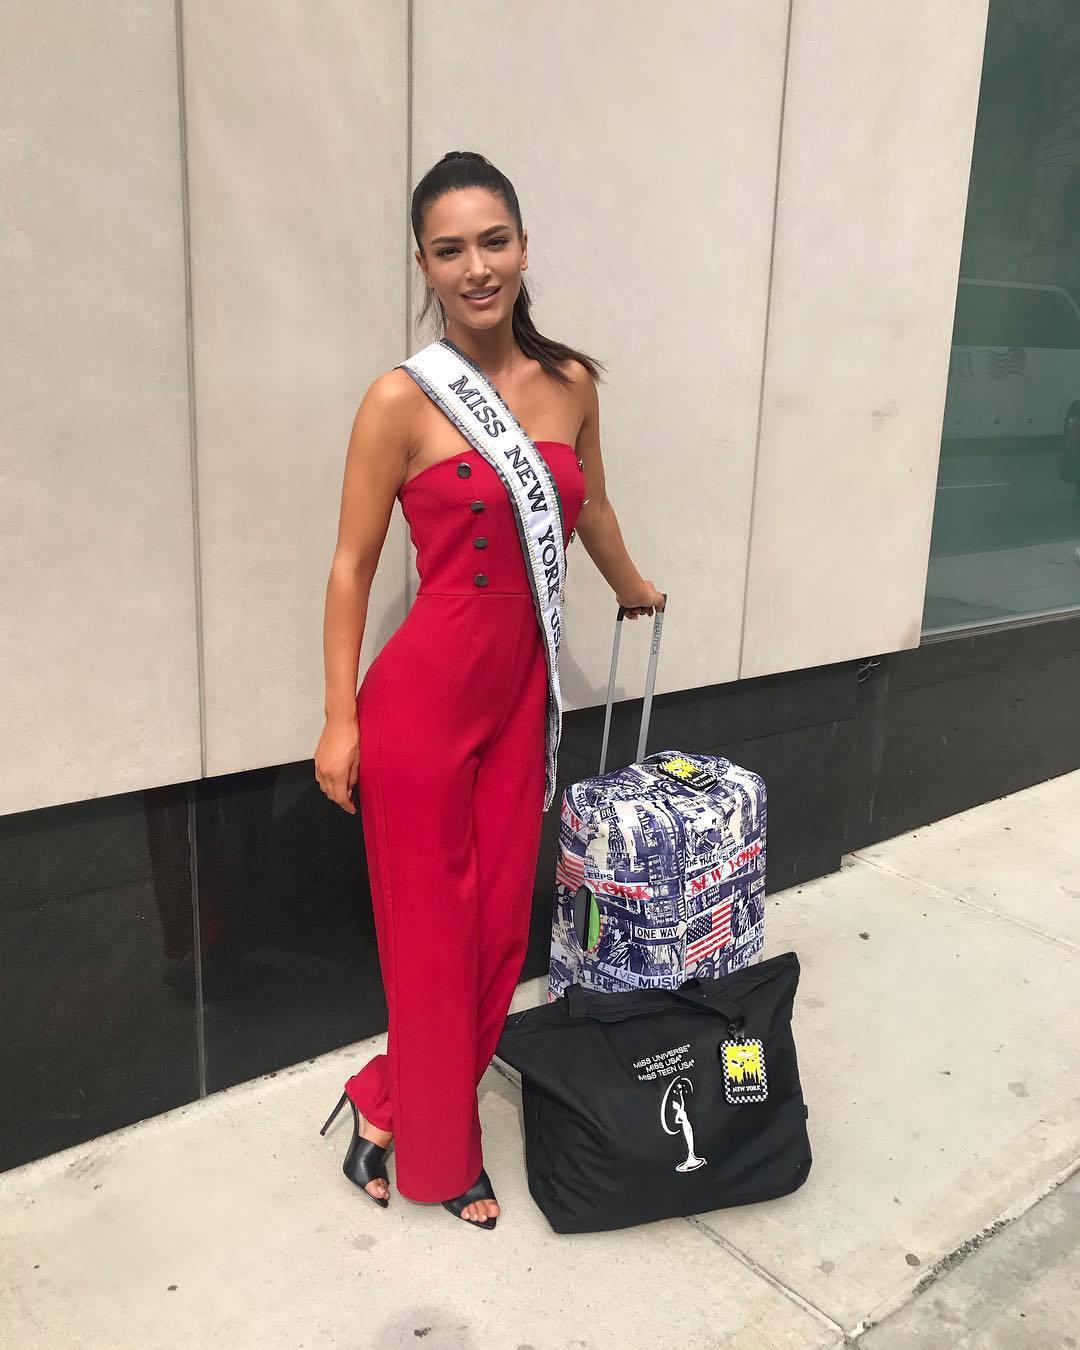 florinda kajtazi, miss new york 2019. - Página 2 56669859_324915721551320_1931283284823694530_n